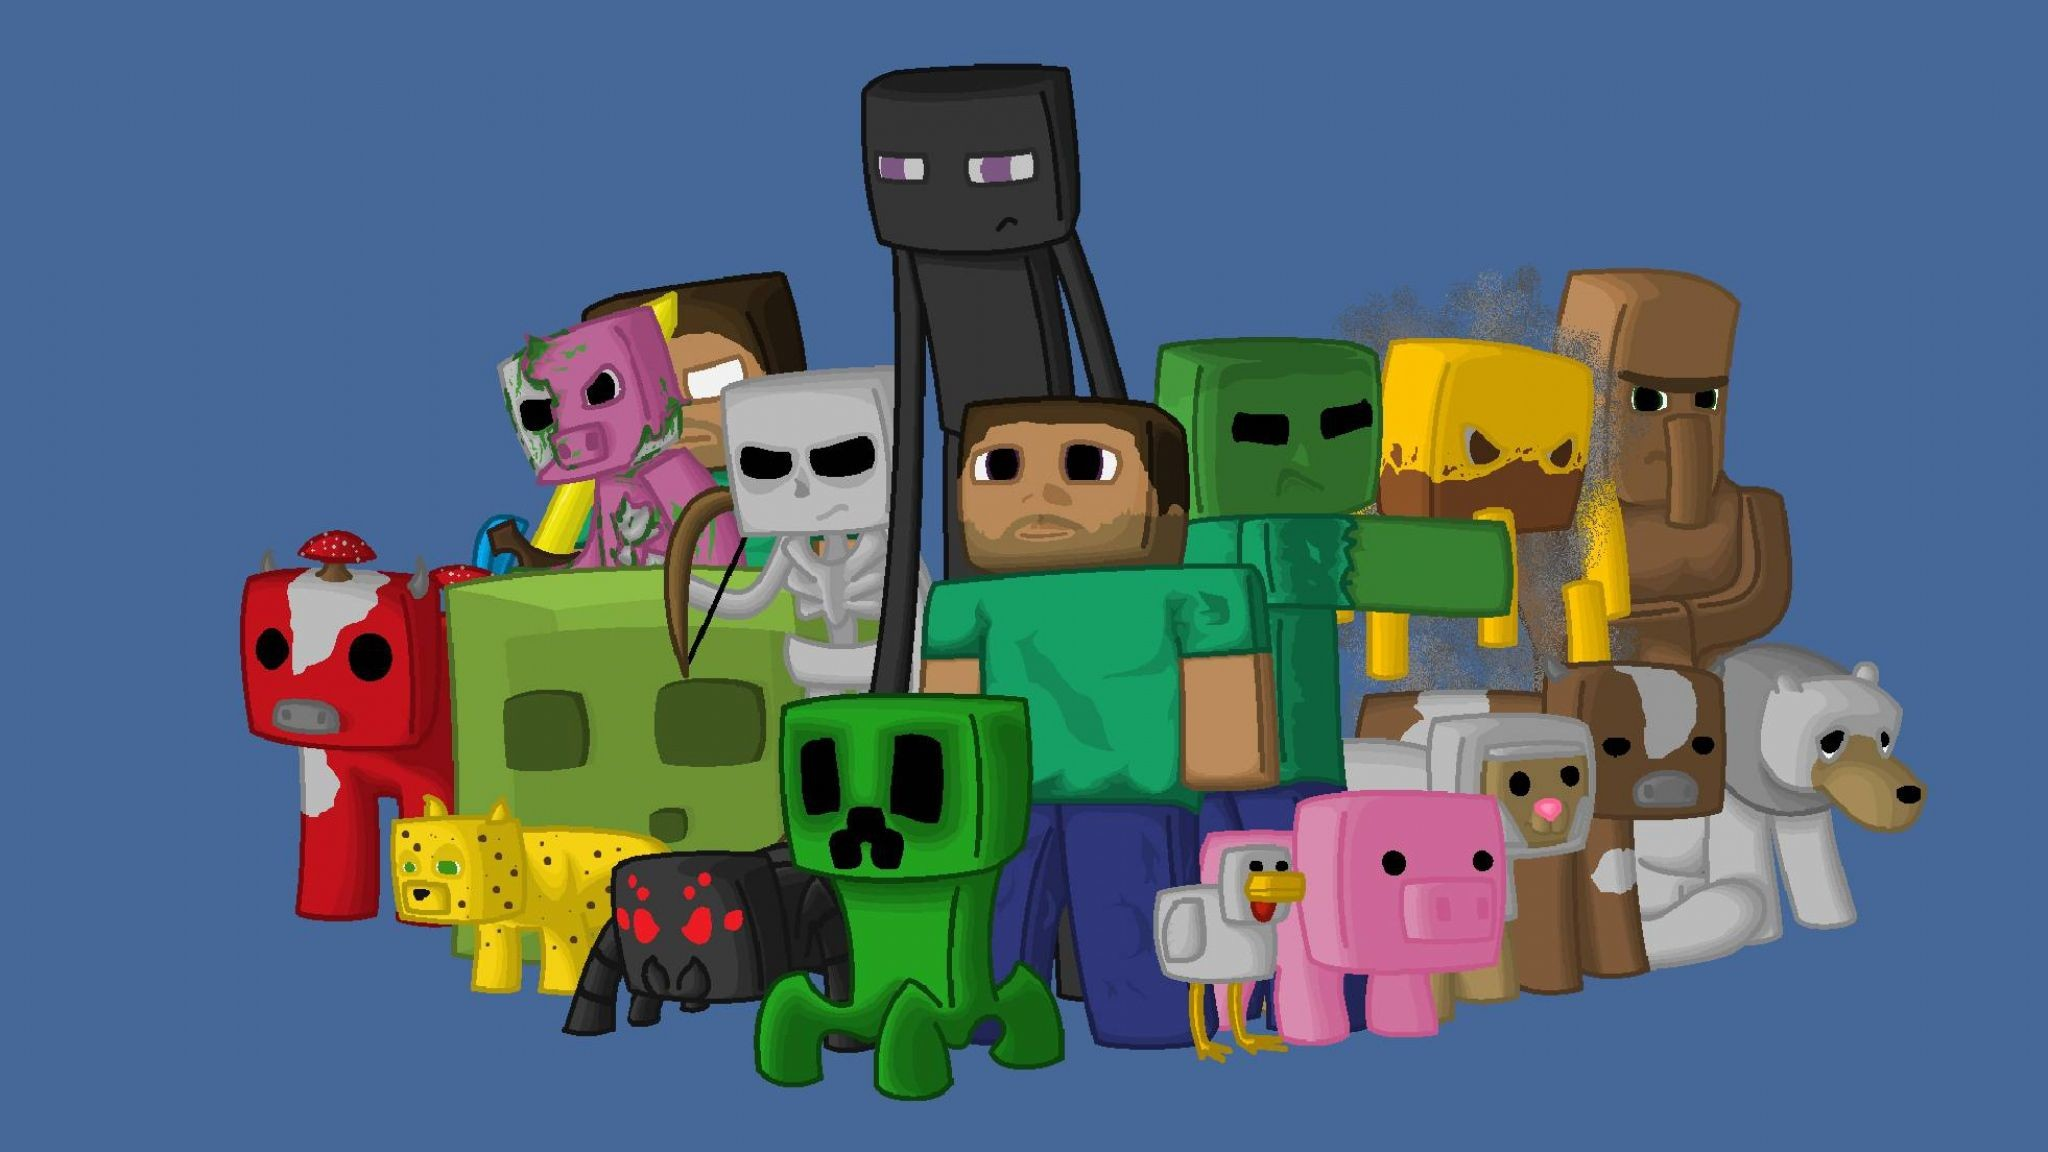 Download Wallpaper Minecraft, Characters, Game, Pixels .